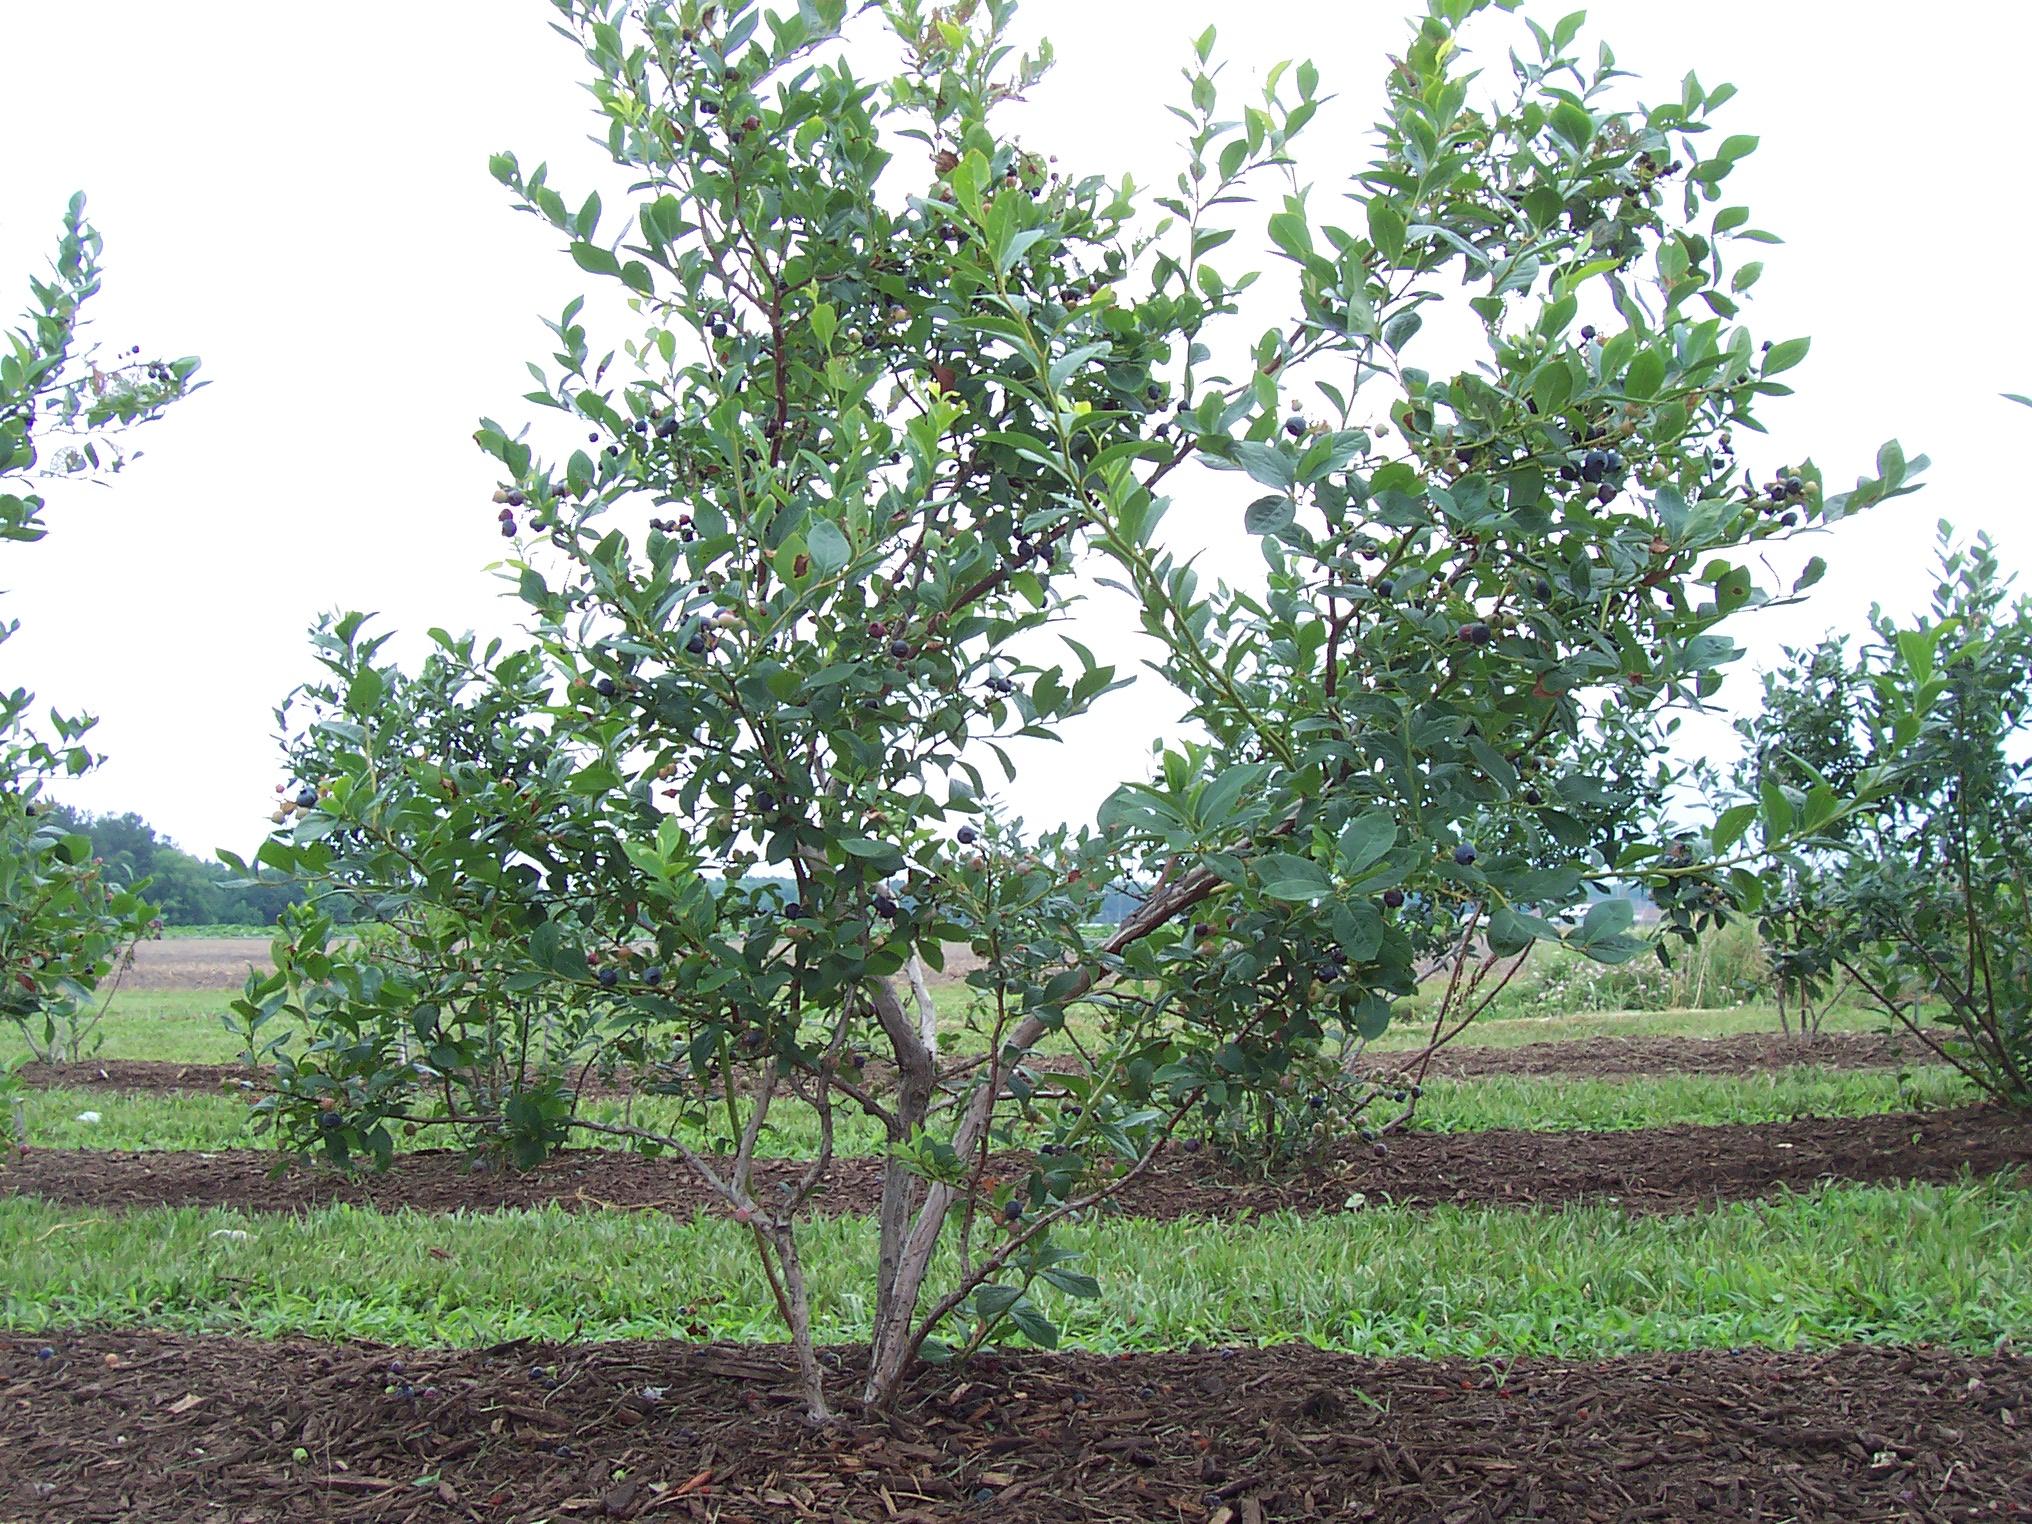 How to plant blueberry bush - Lenoir Blueberry Bush One Of 25 Blueberry Bushes Grown